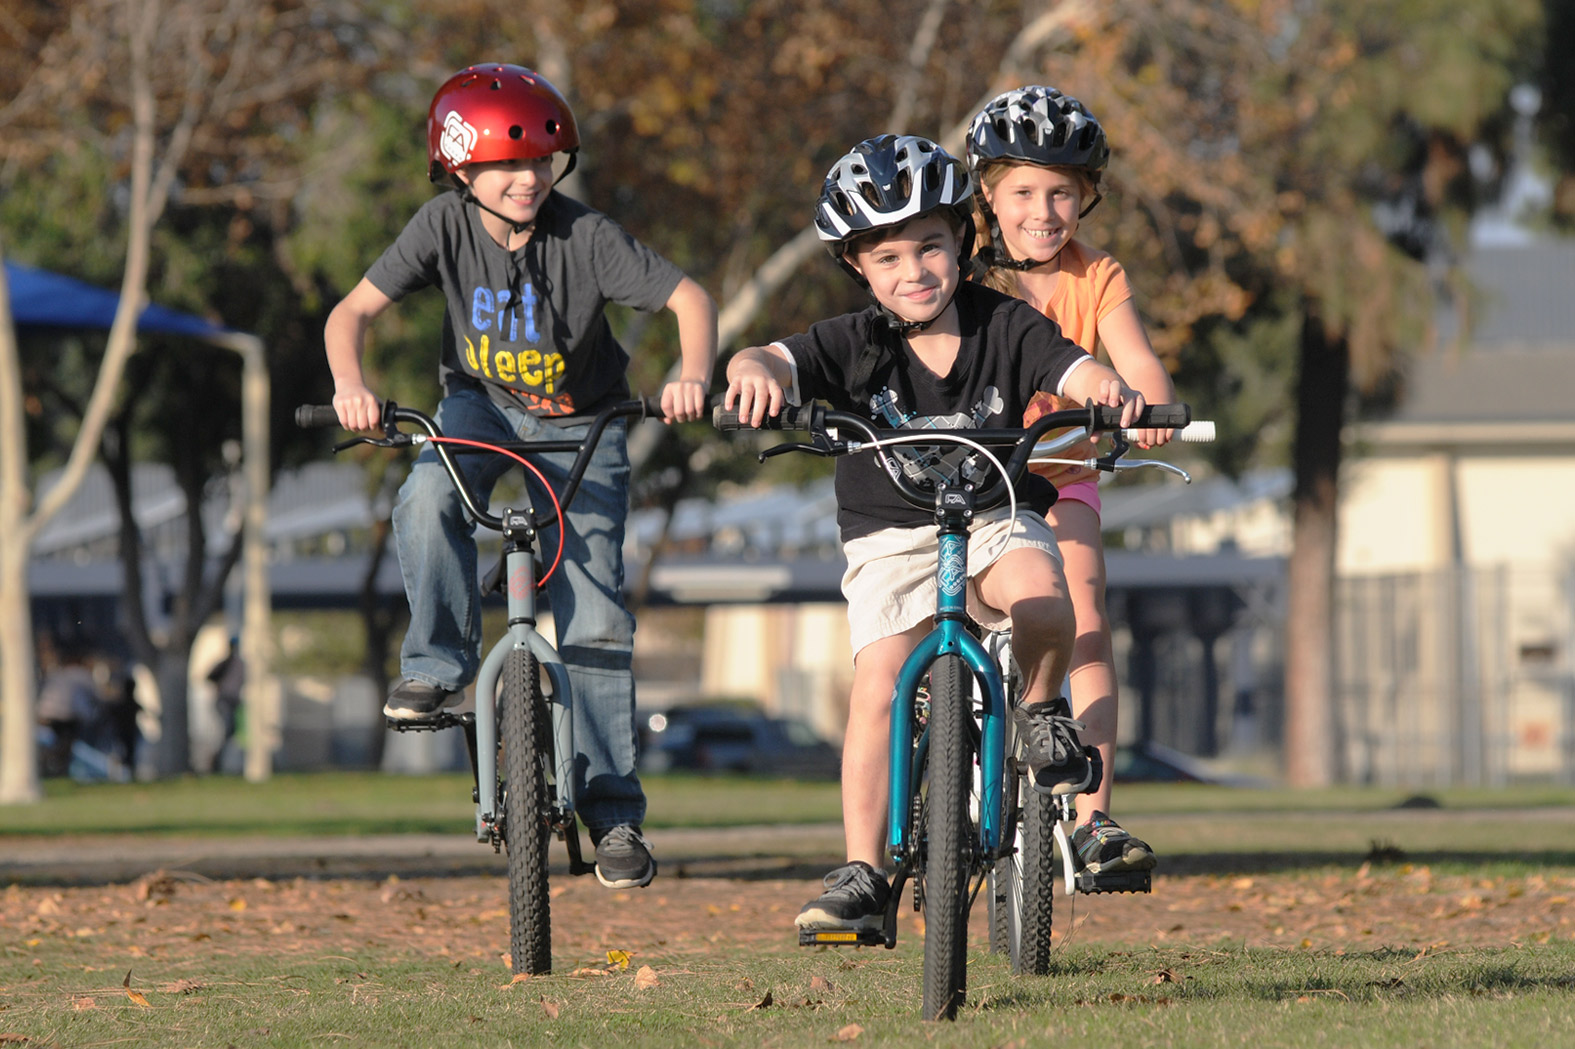 Three children riding Free Agent BMX bikes together